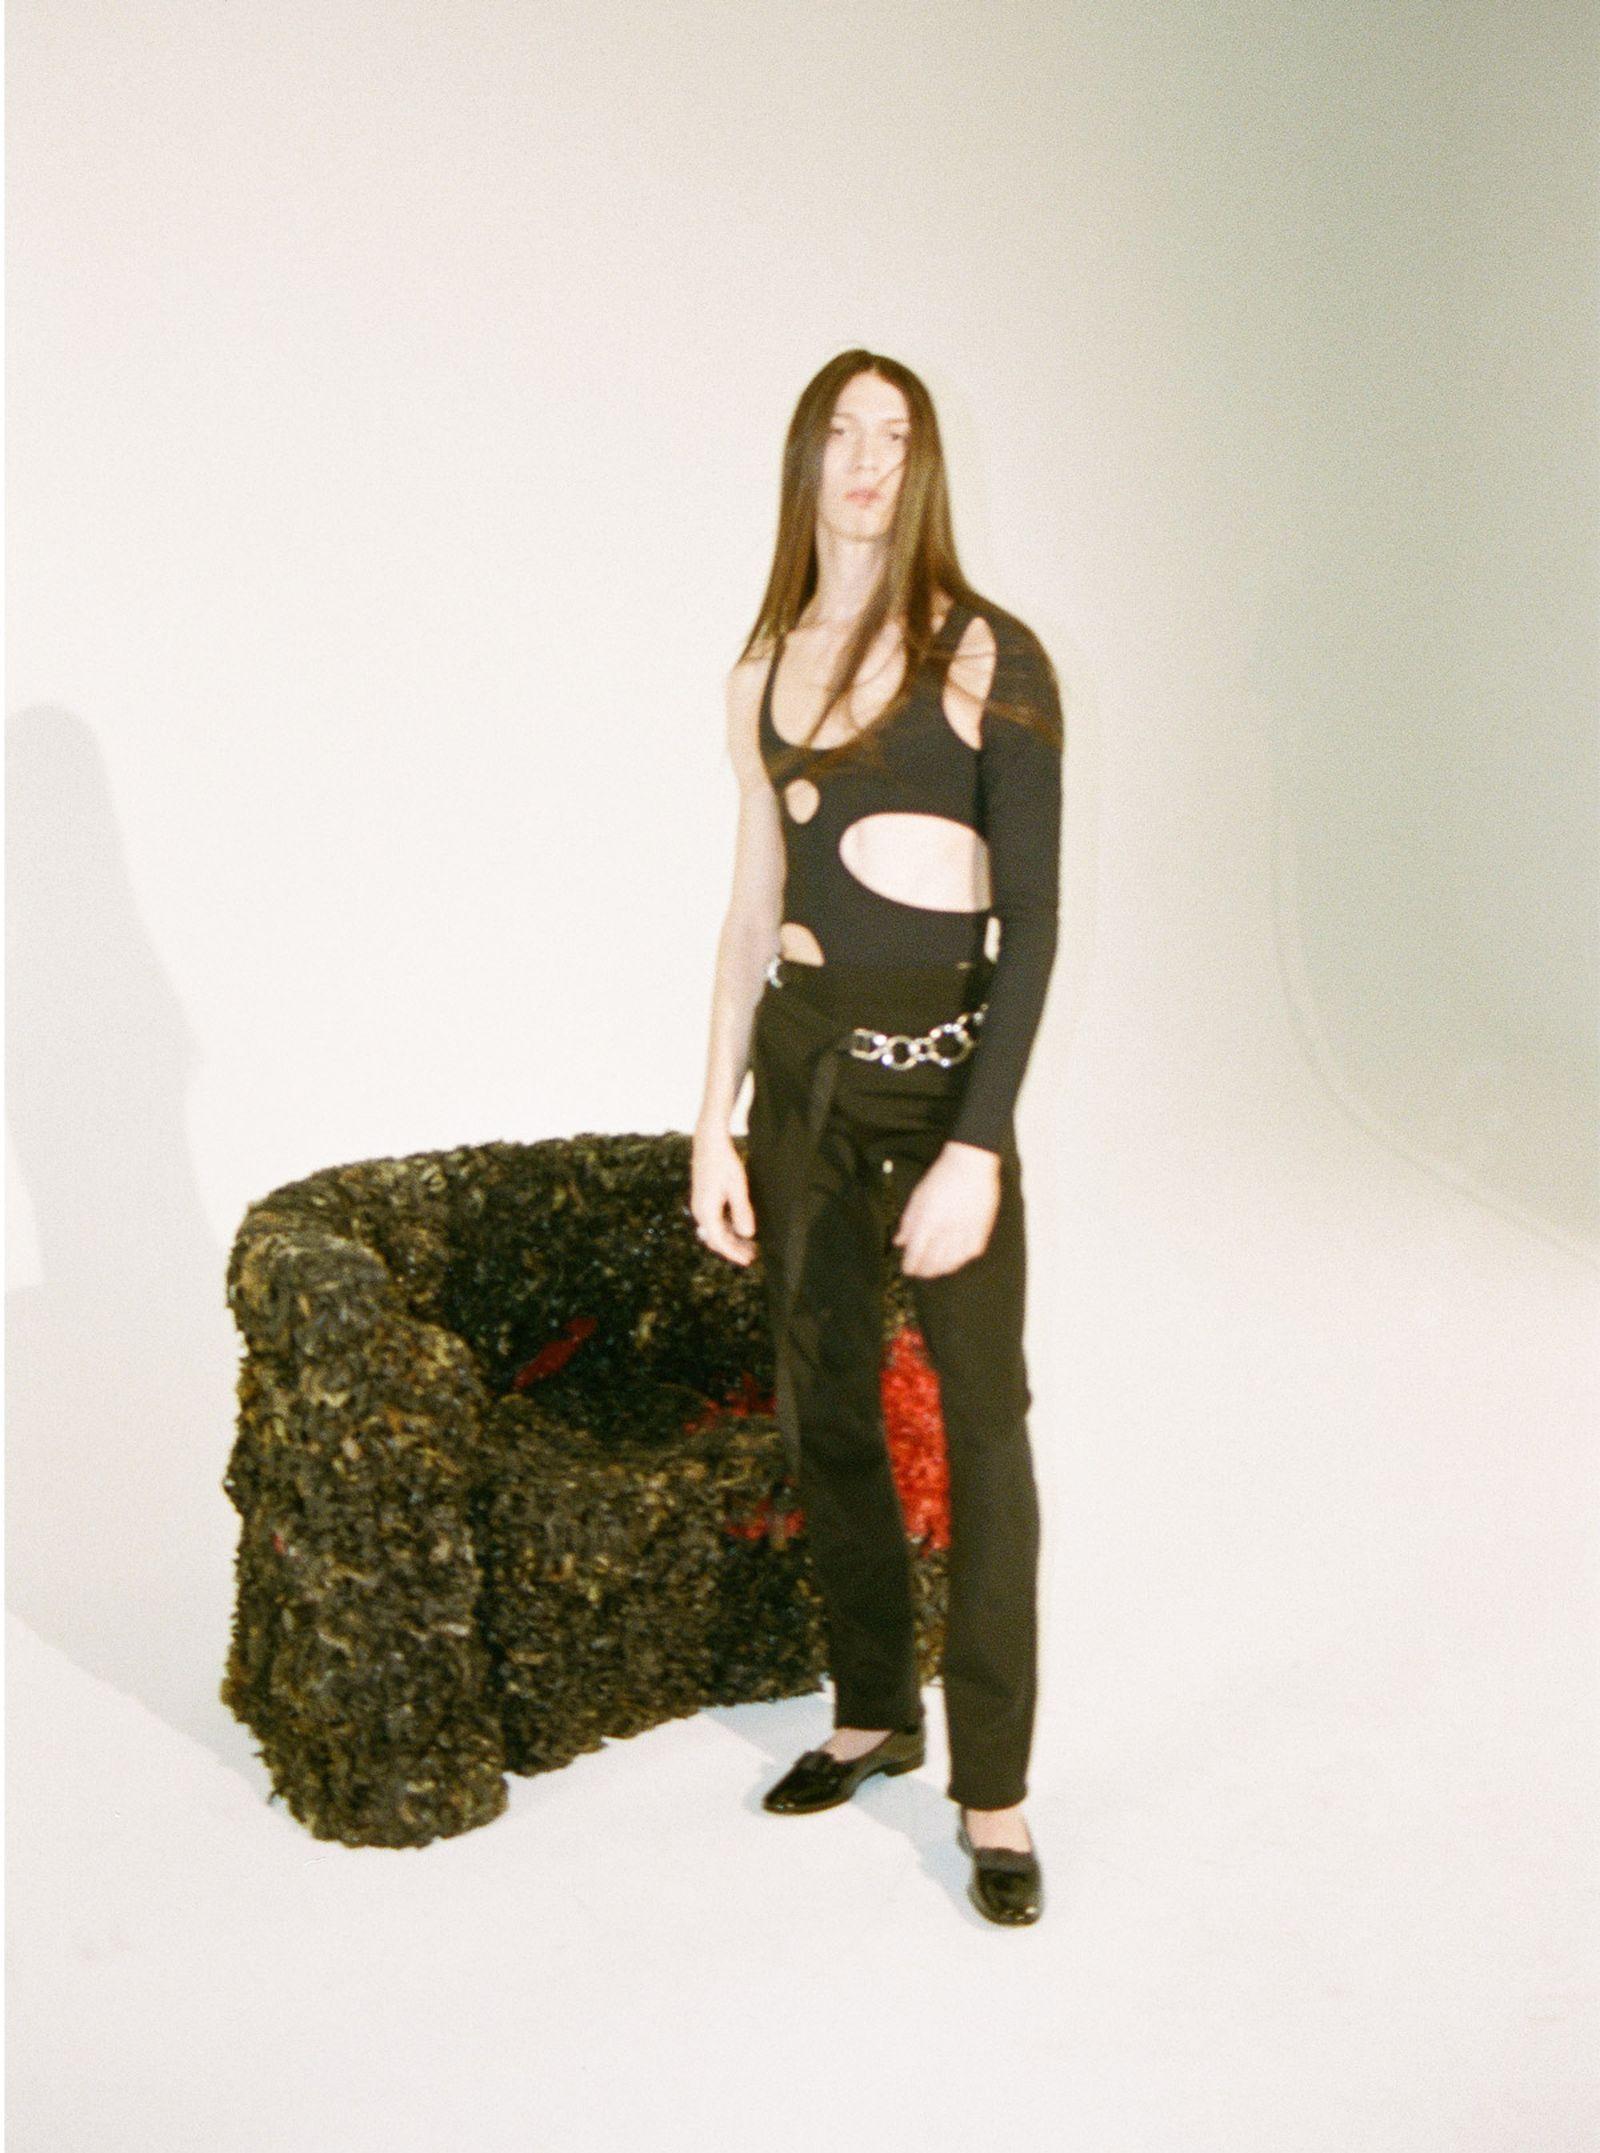 friedman-benda-furniture-fashion-05